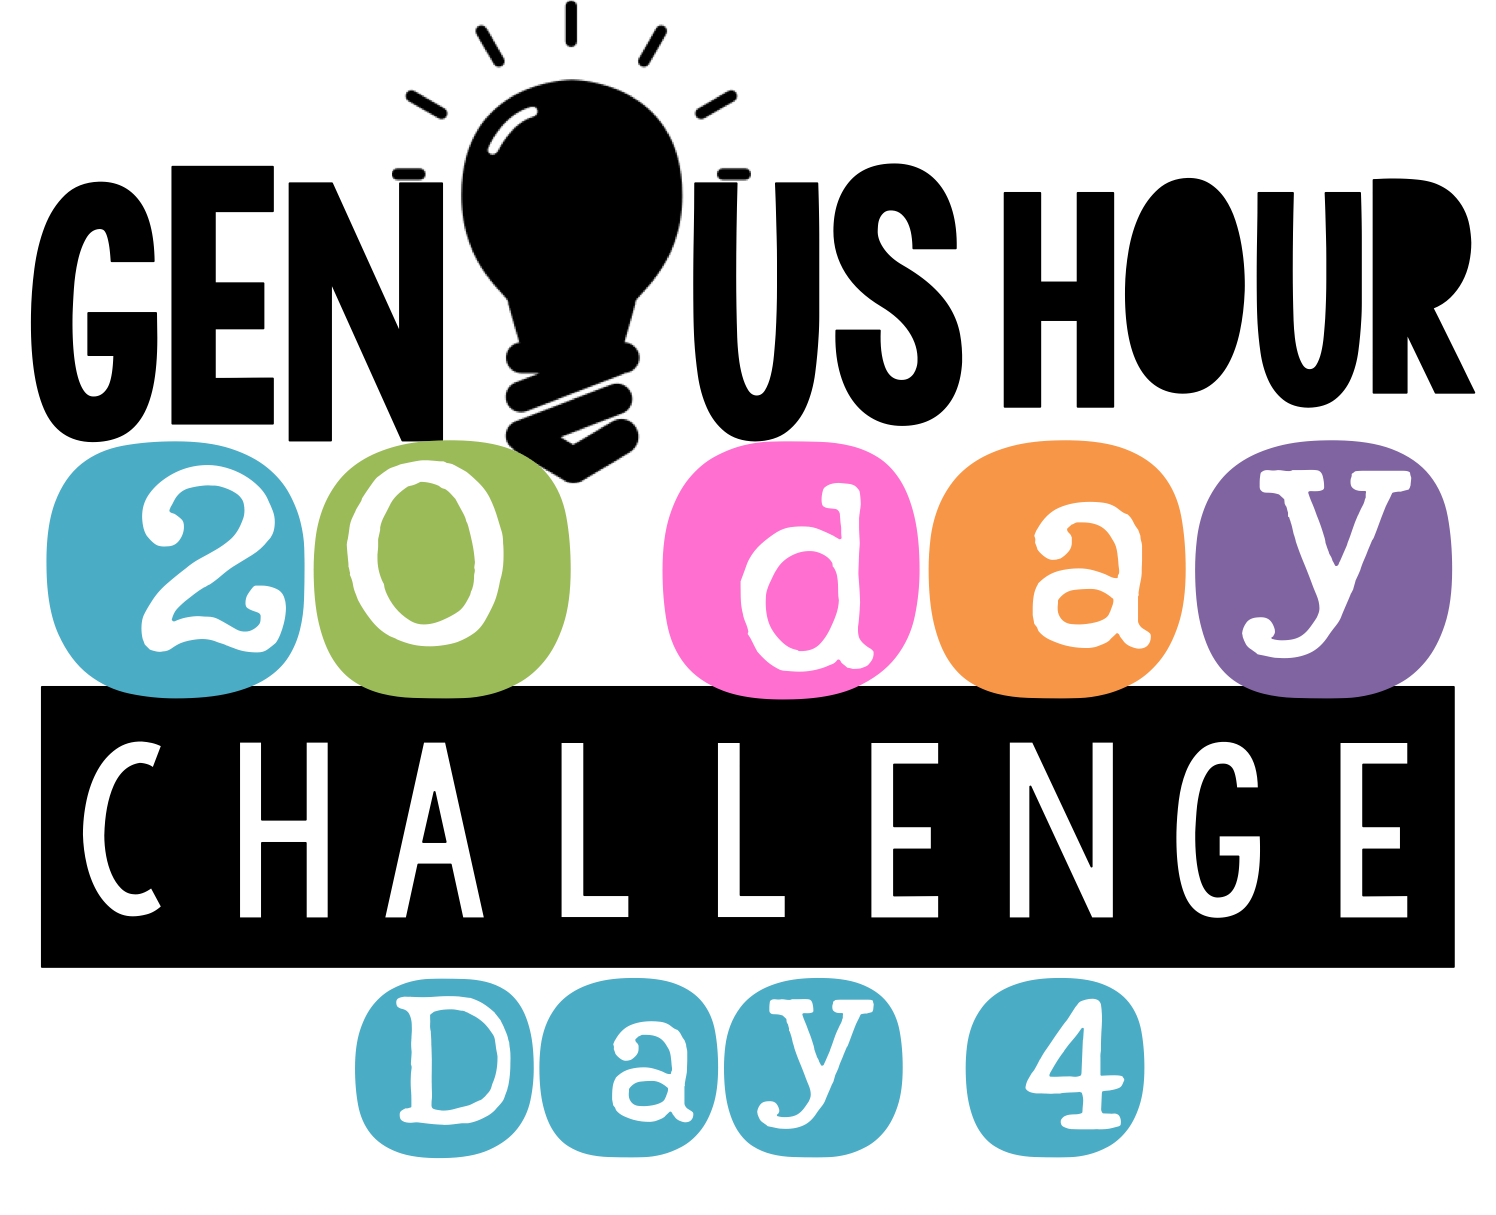 Genius Hour 20 Day Challenge